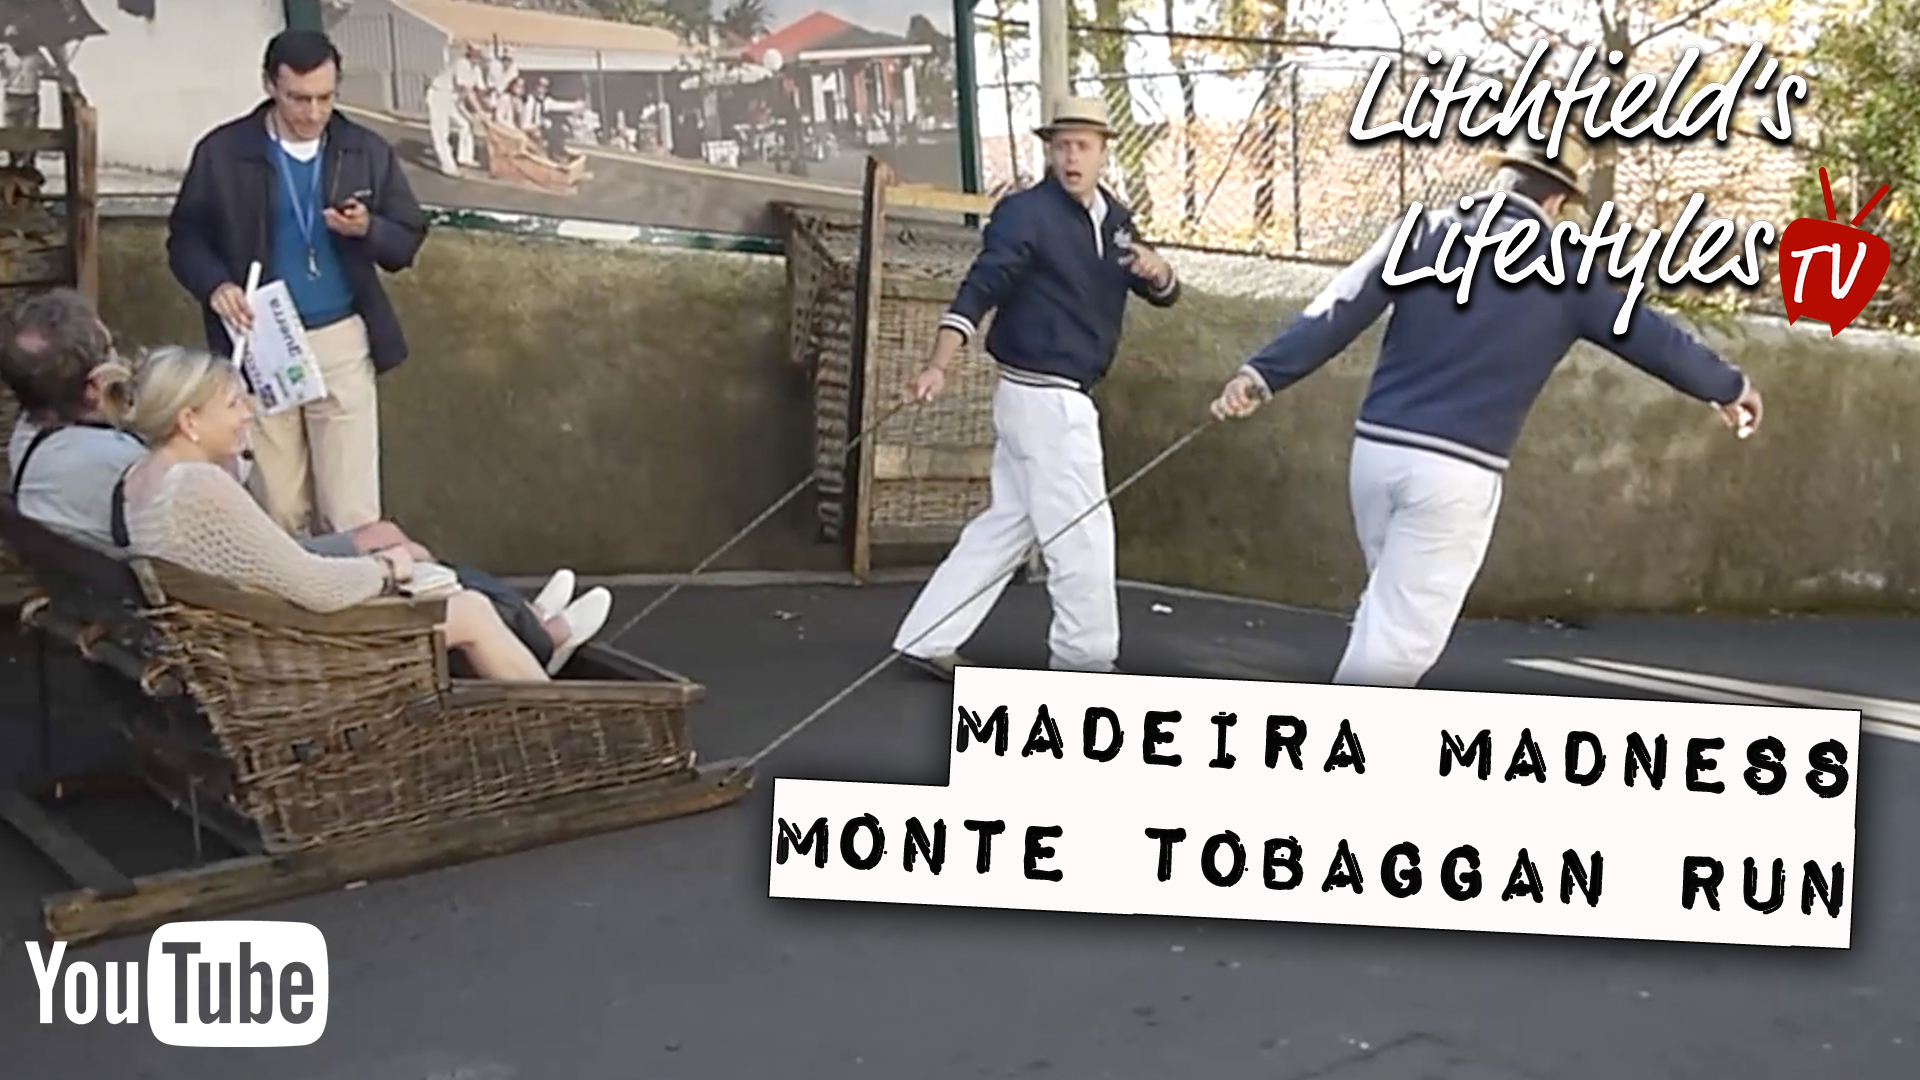 Madeira Madness:  The Monte Tobaggan Run